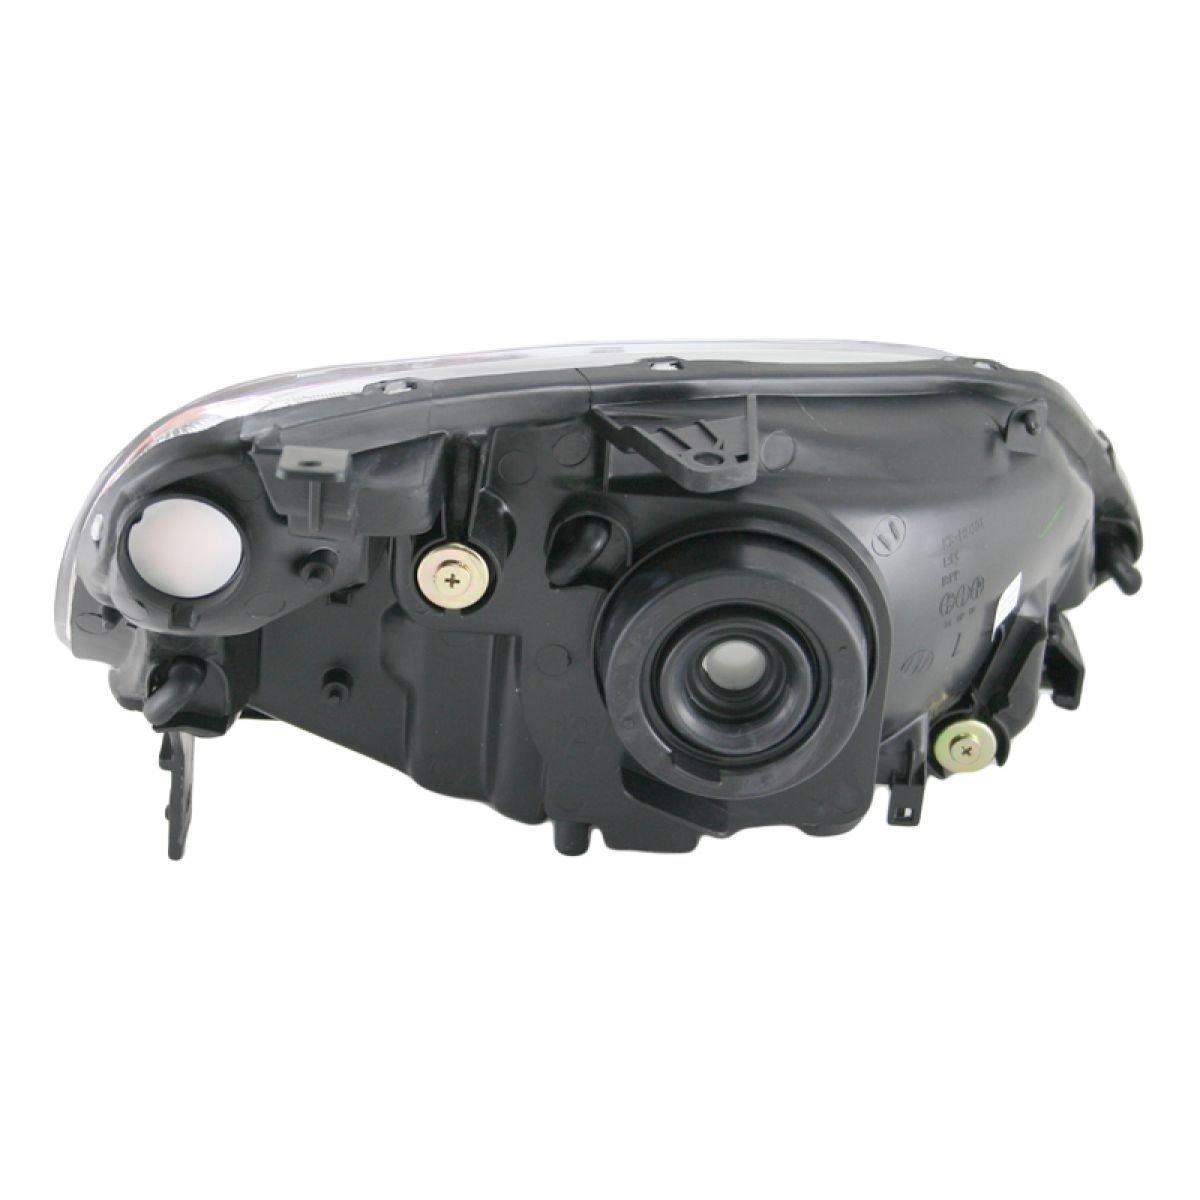 Newmar Ventana 2005-2010 RV Motorhome Left (Driver) Replacement Headlight Head Light Front Lamp